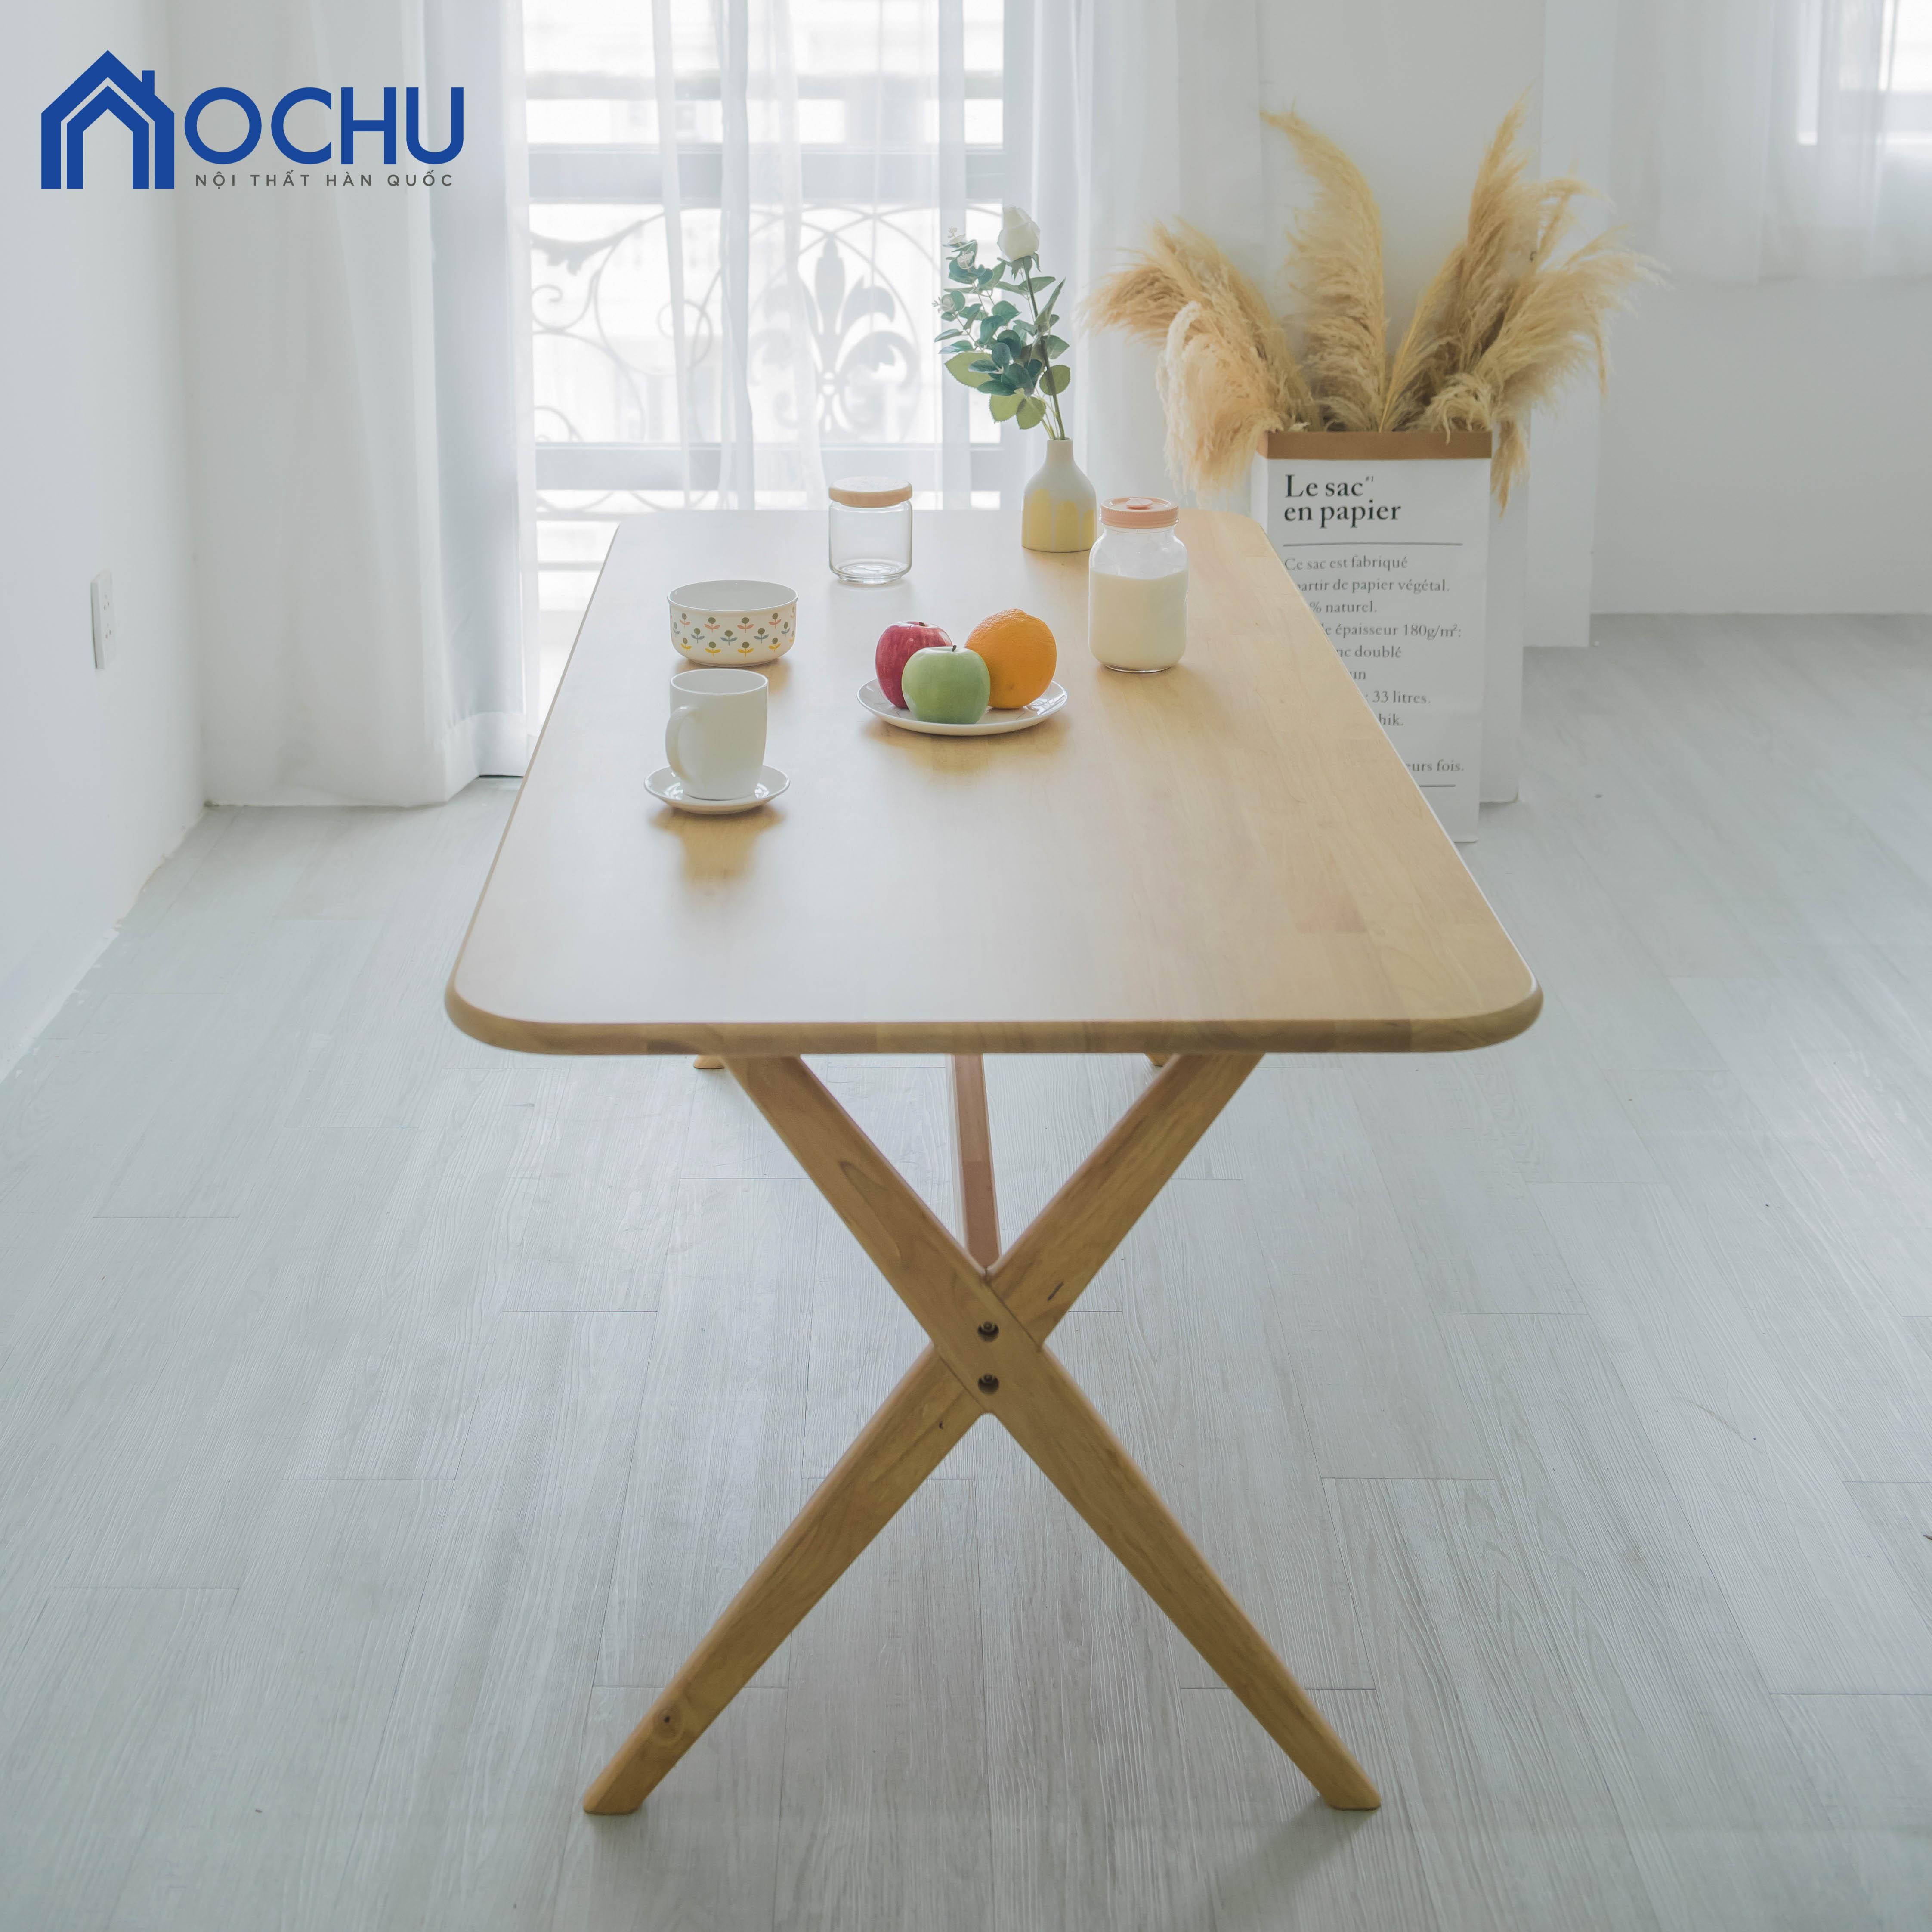 Bàn Ăn Gỗ Cao Su OCHU - Tandy Table - Natural